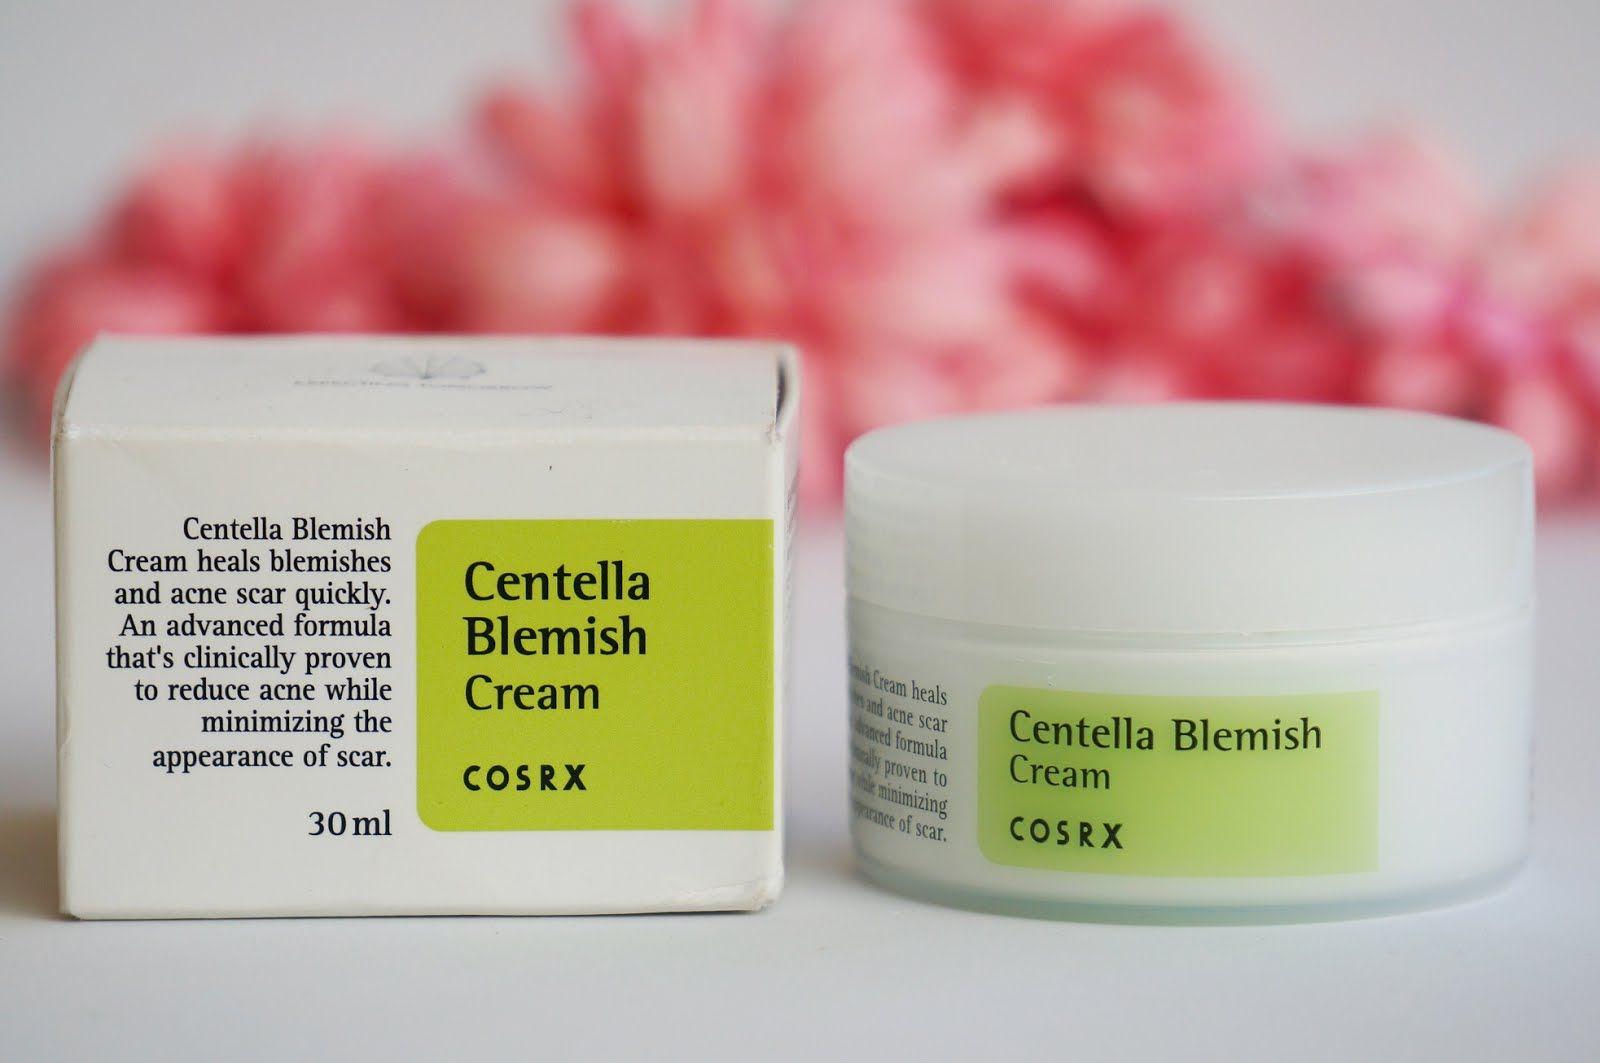 Cosrx Centella Blemish Ampoule Review Indonesiasuugaarnet Wardah Essential Facial Scrub 600 Ml Indonesia Cente